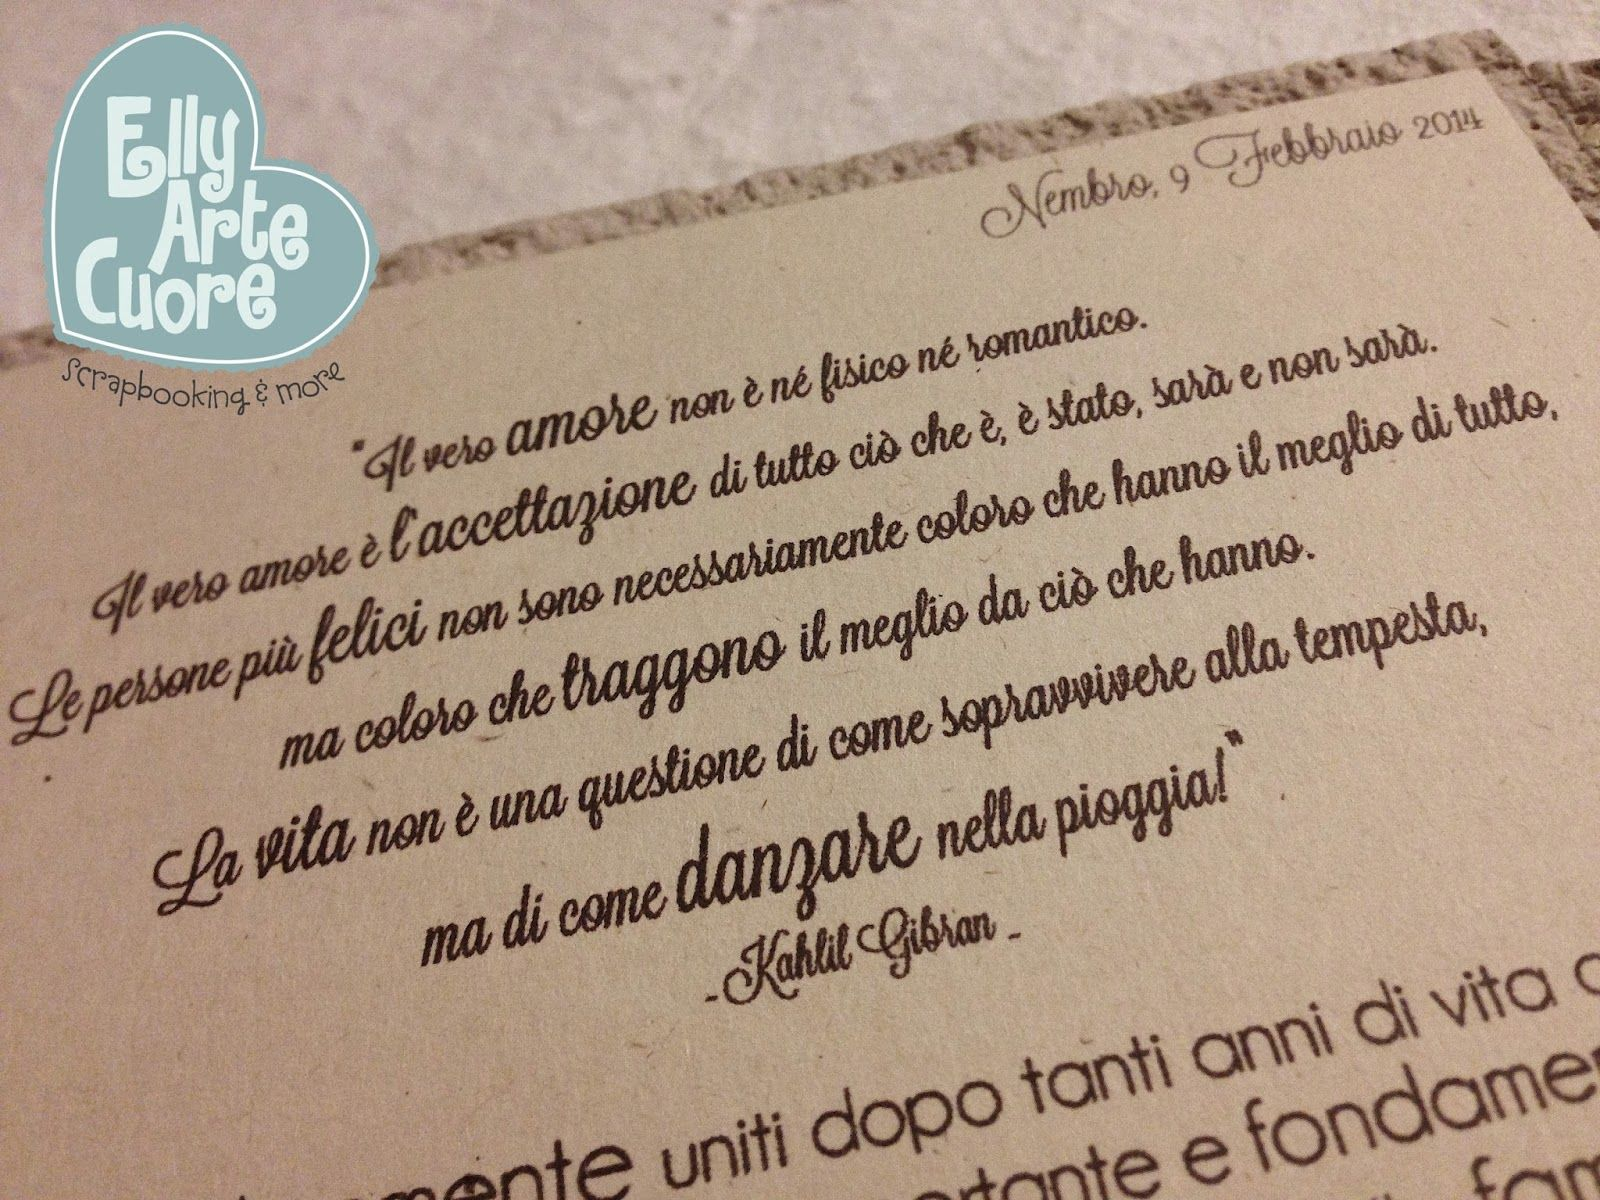 Frasi Di Auguri Per Matrimonio Le 100 Piu Semplici Classiche Ed